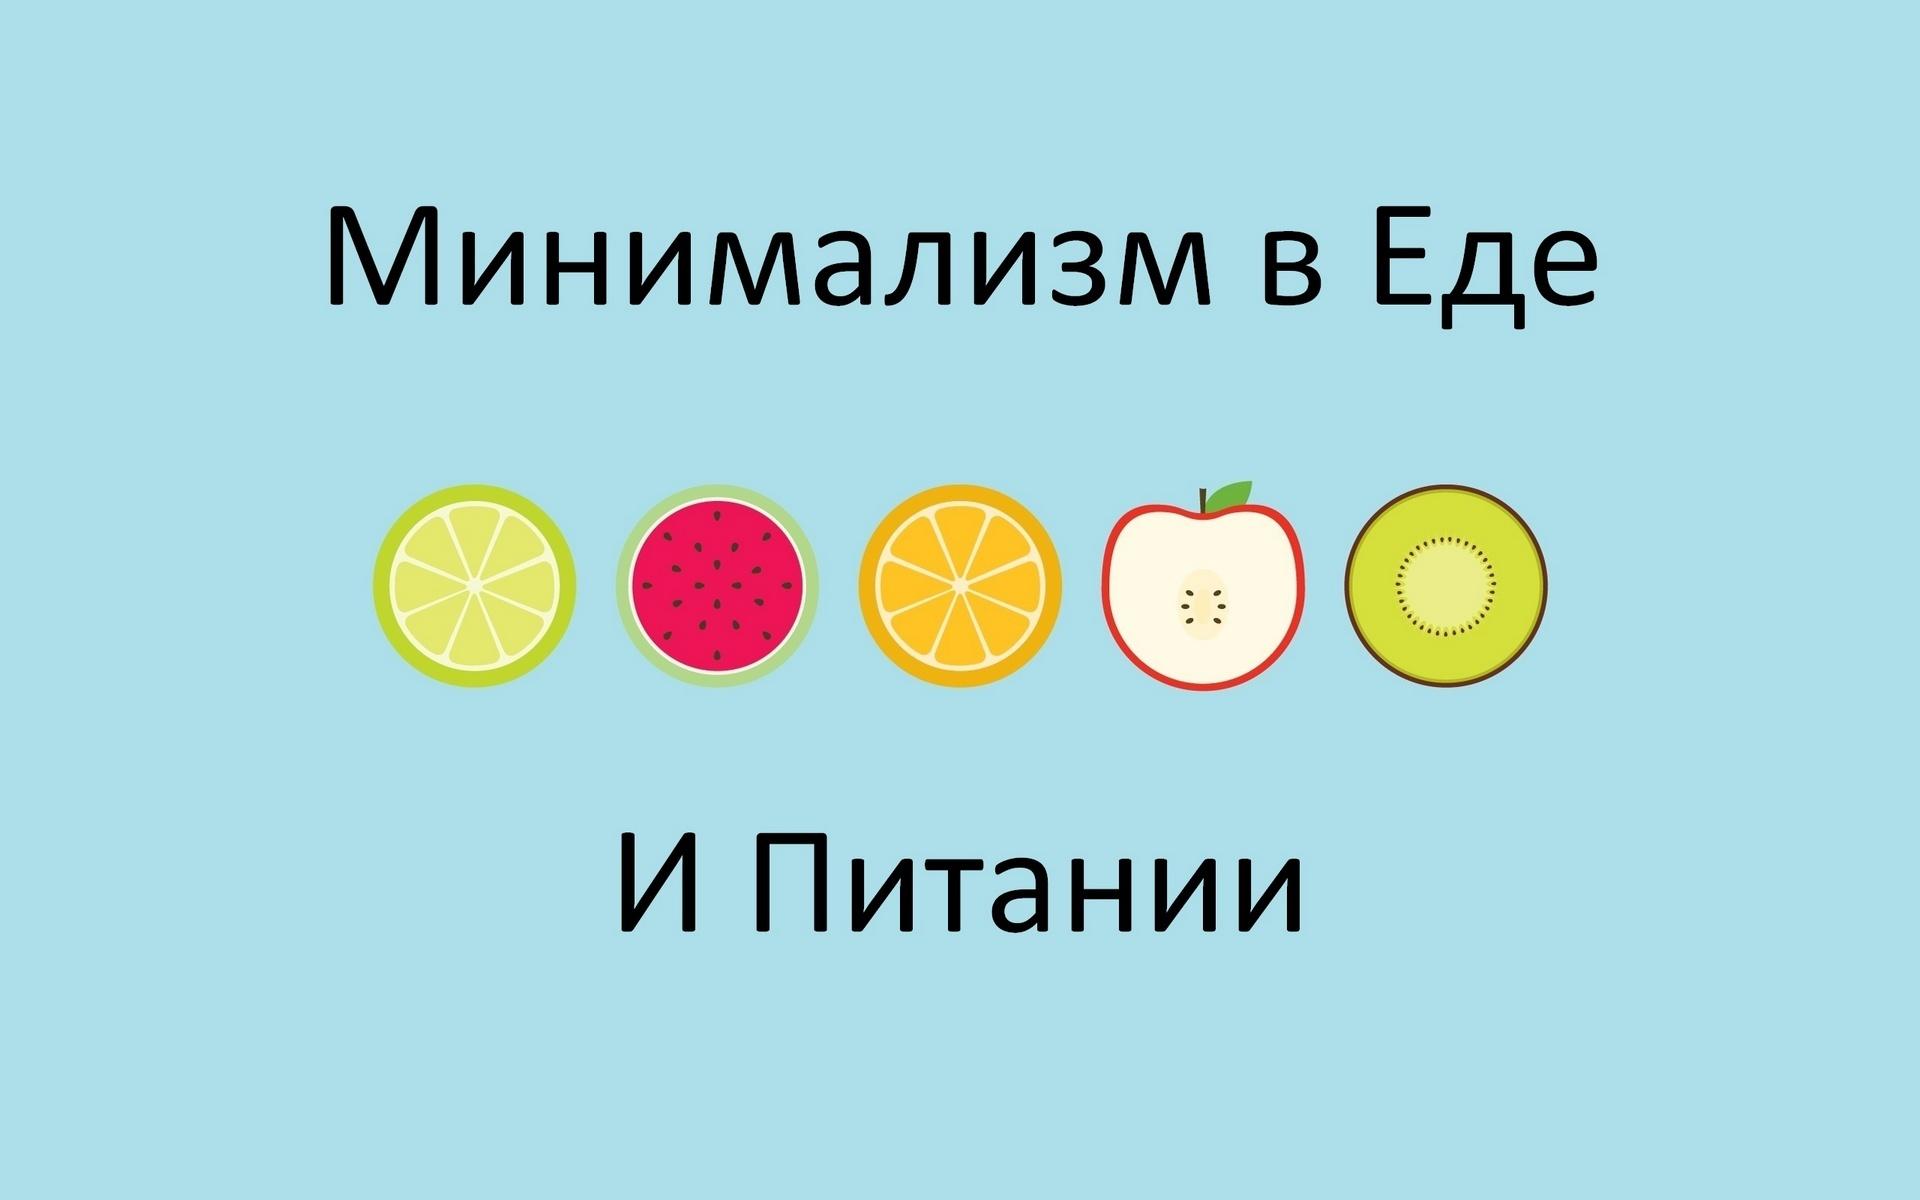 Минимализм в еде и питании